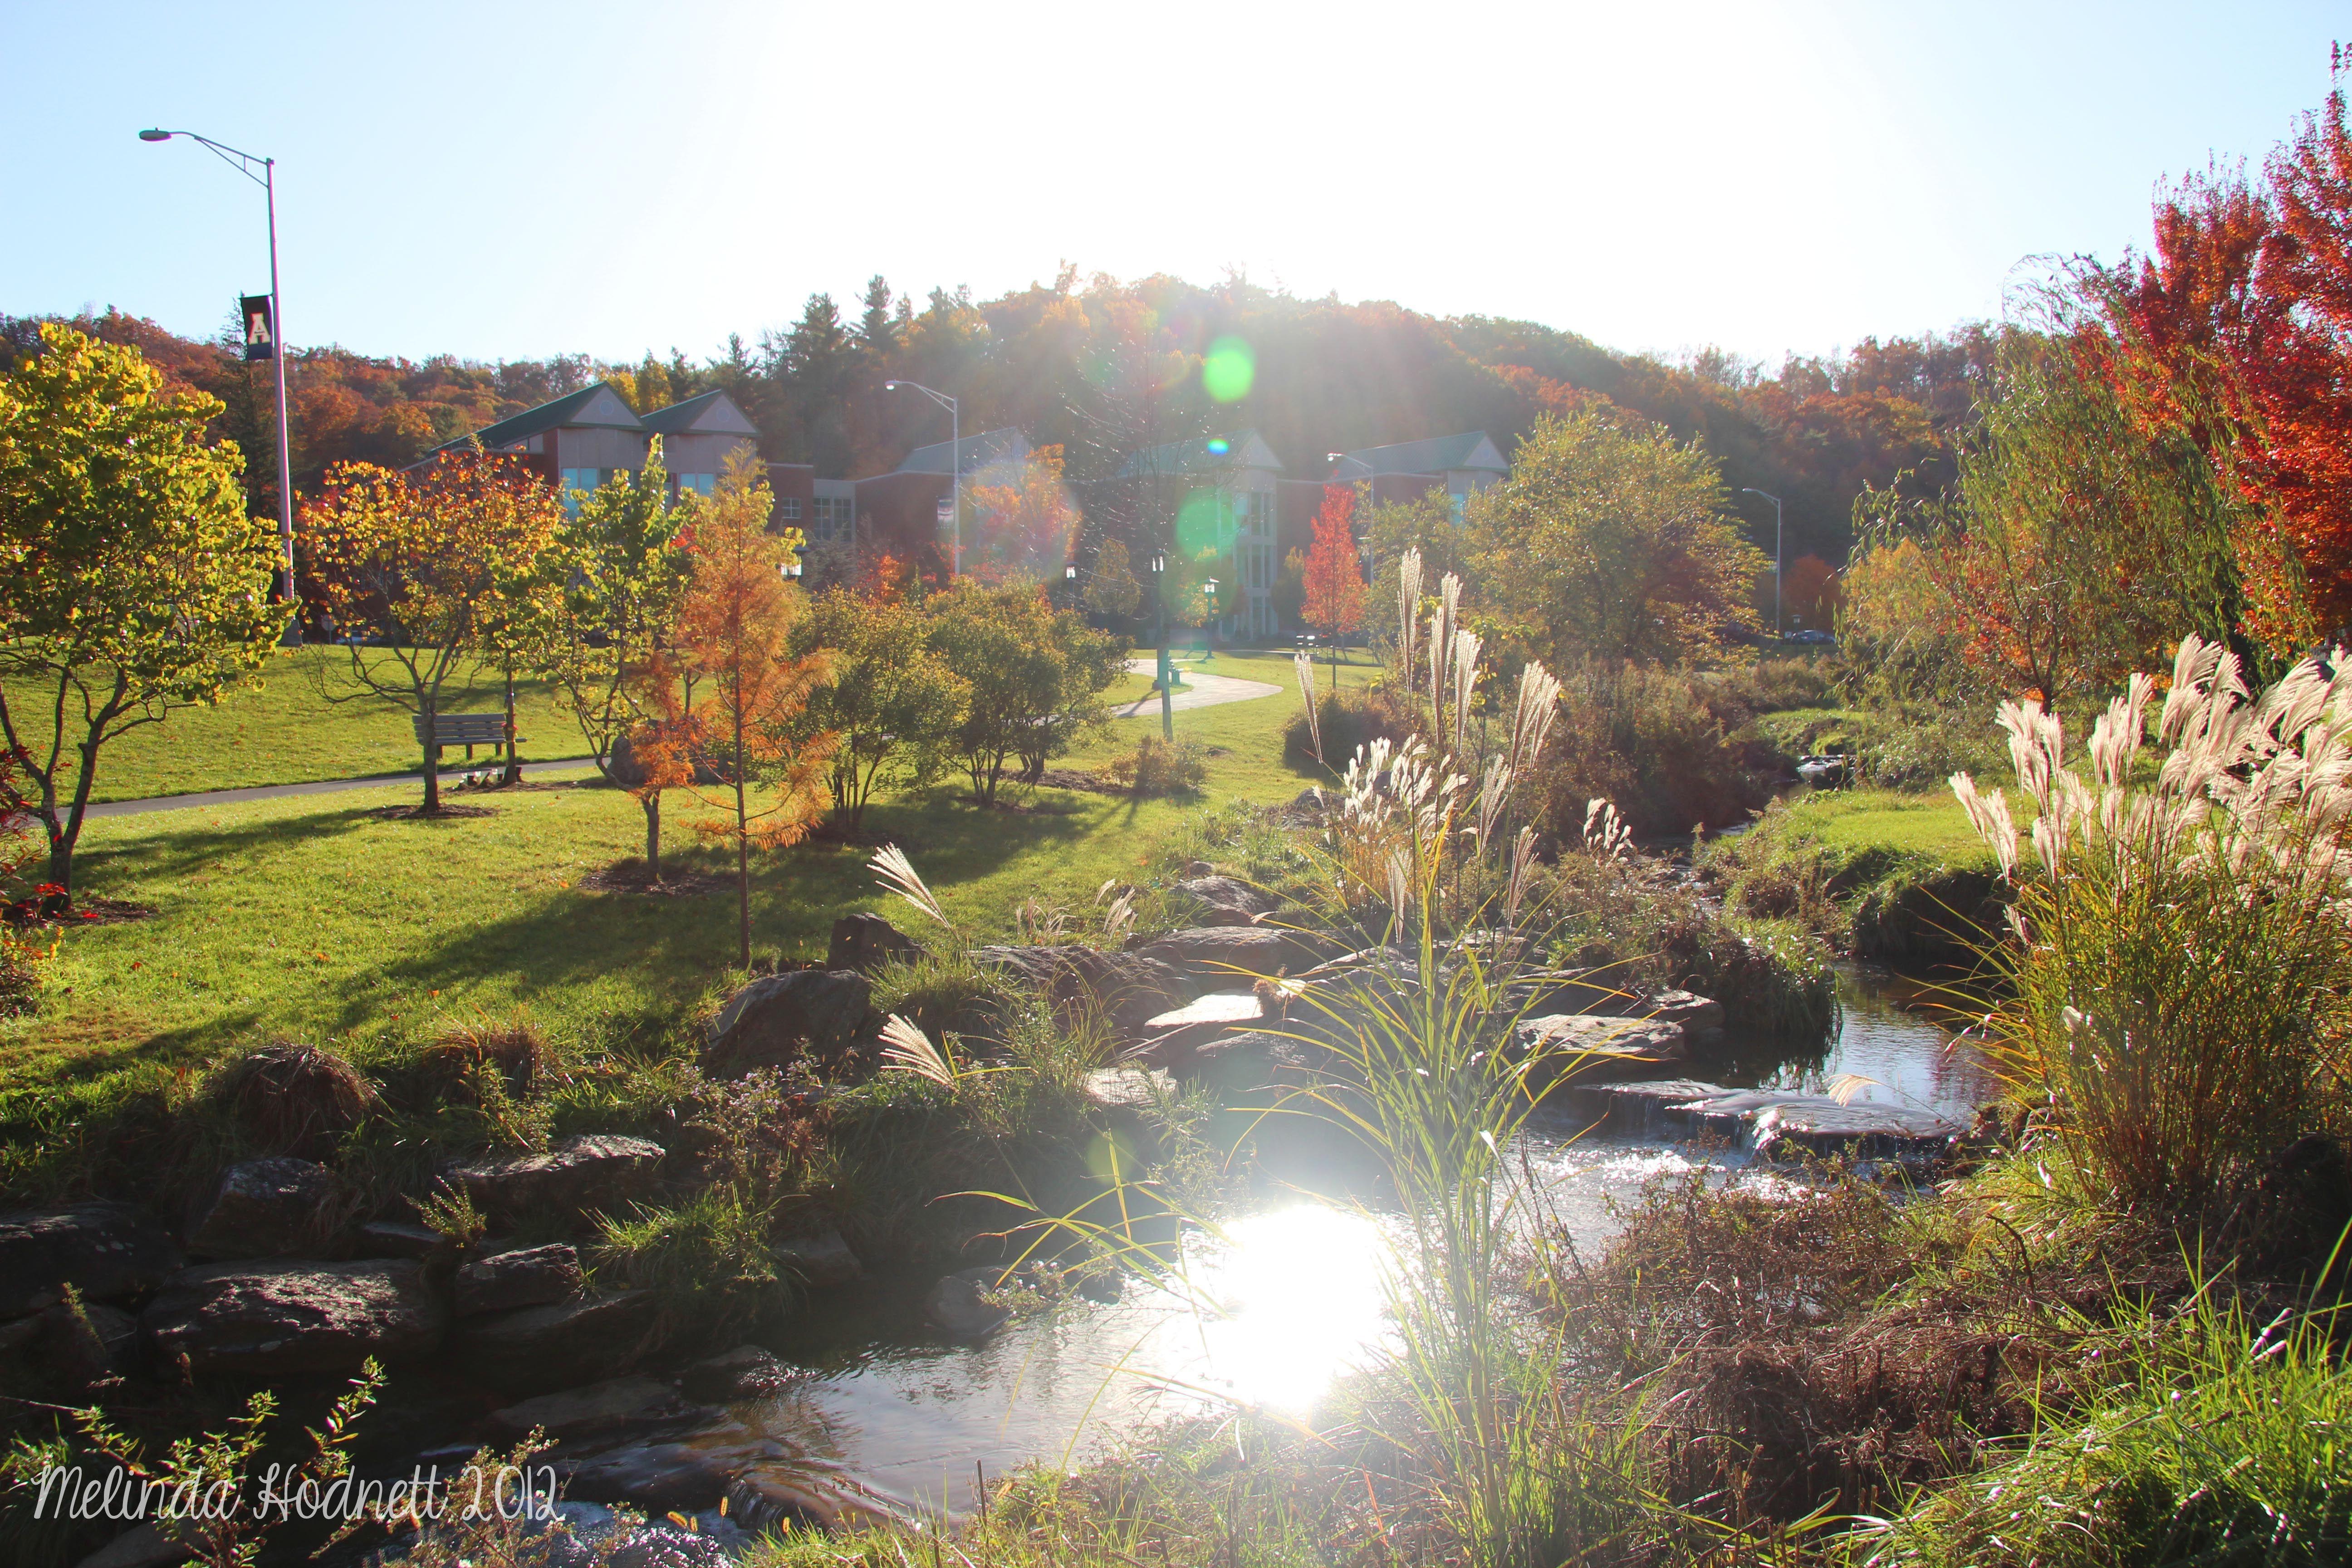 Durham Park, Appalachian State University, Boone, NC. Fall